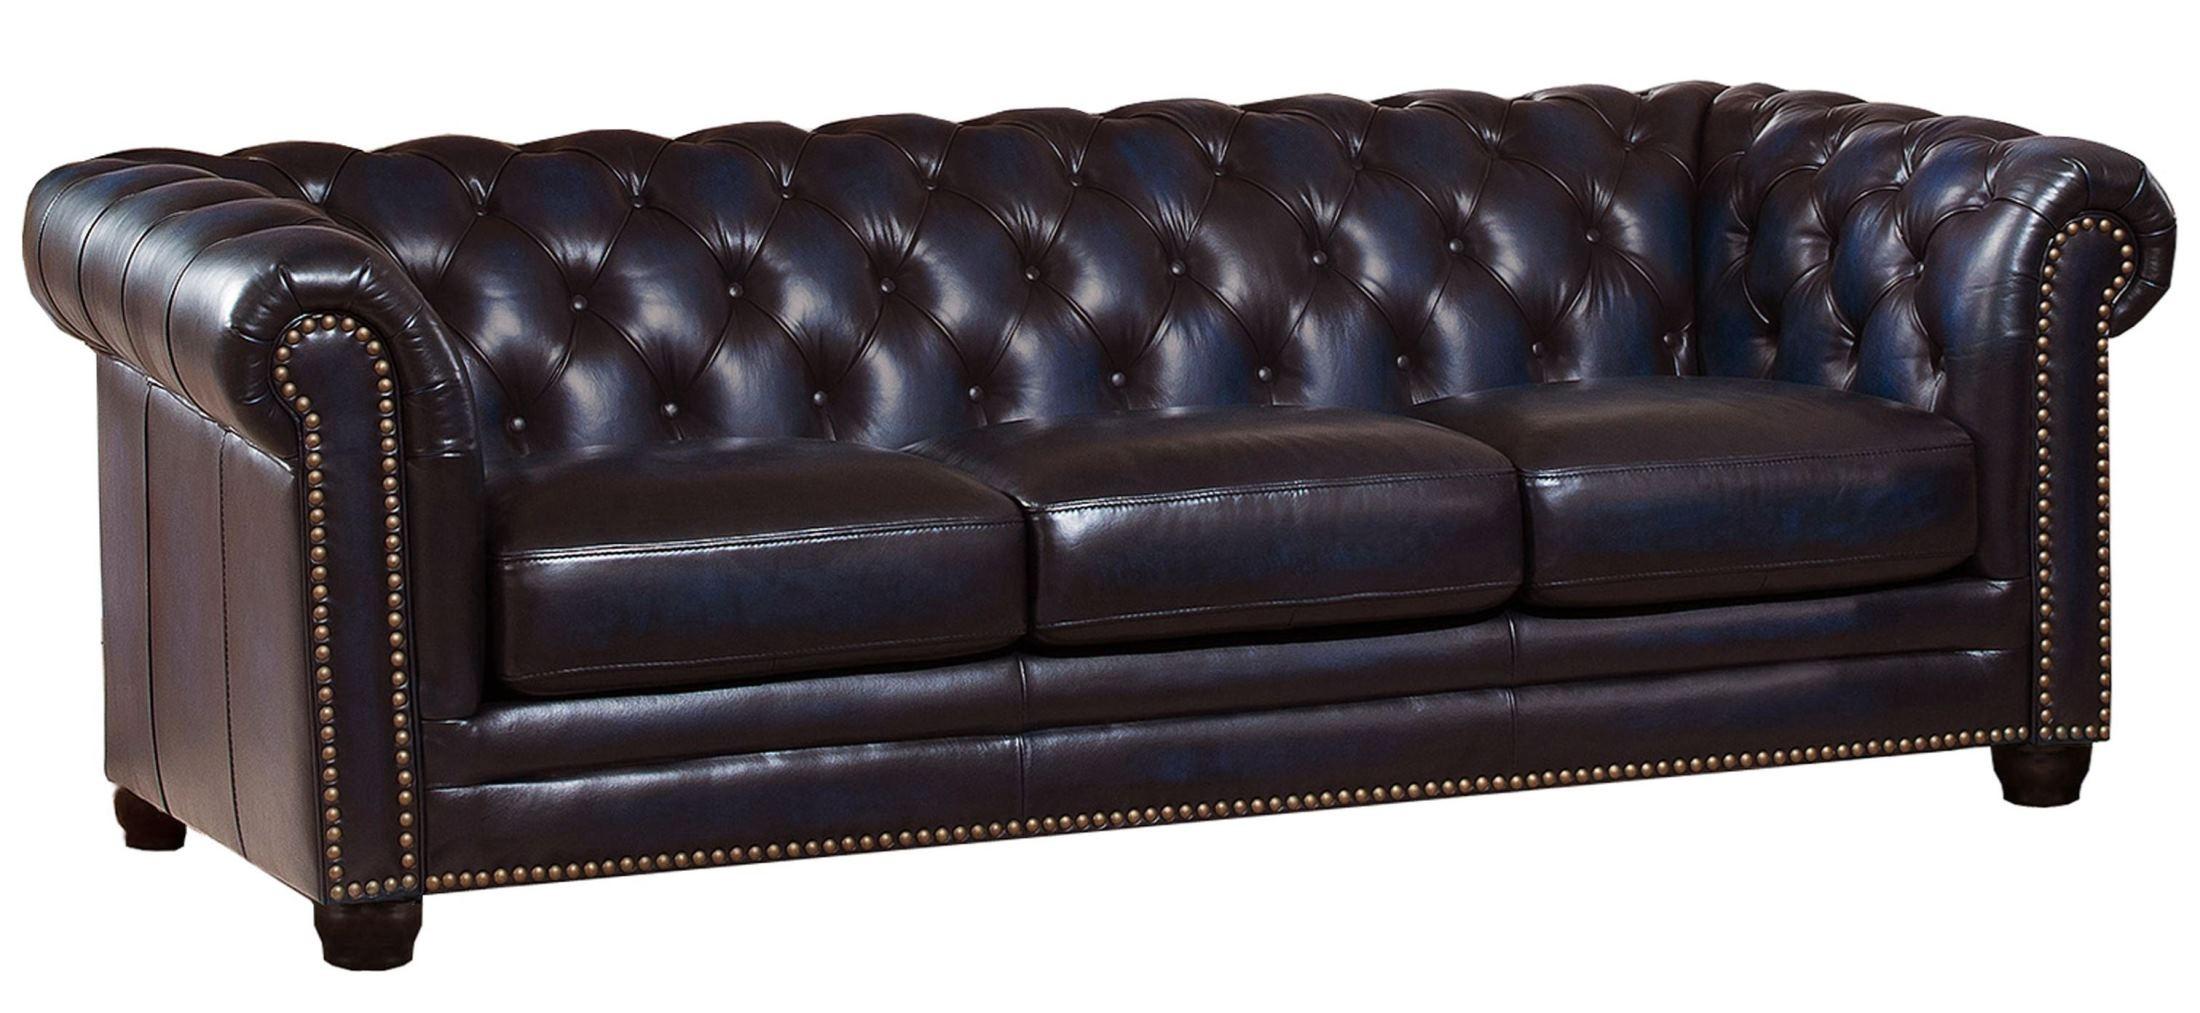 Dynasty Navy Blue Leather Sofa